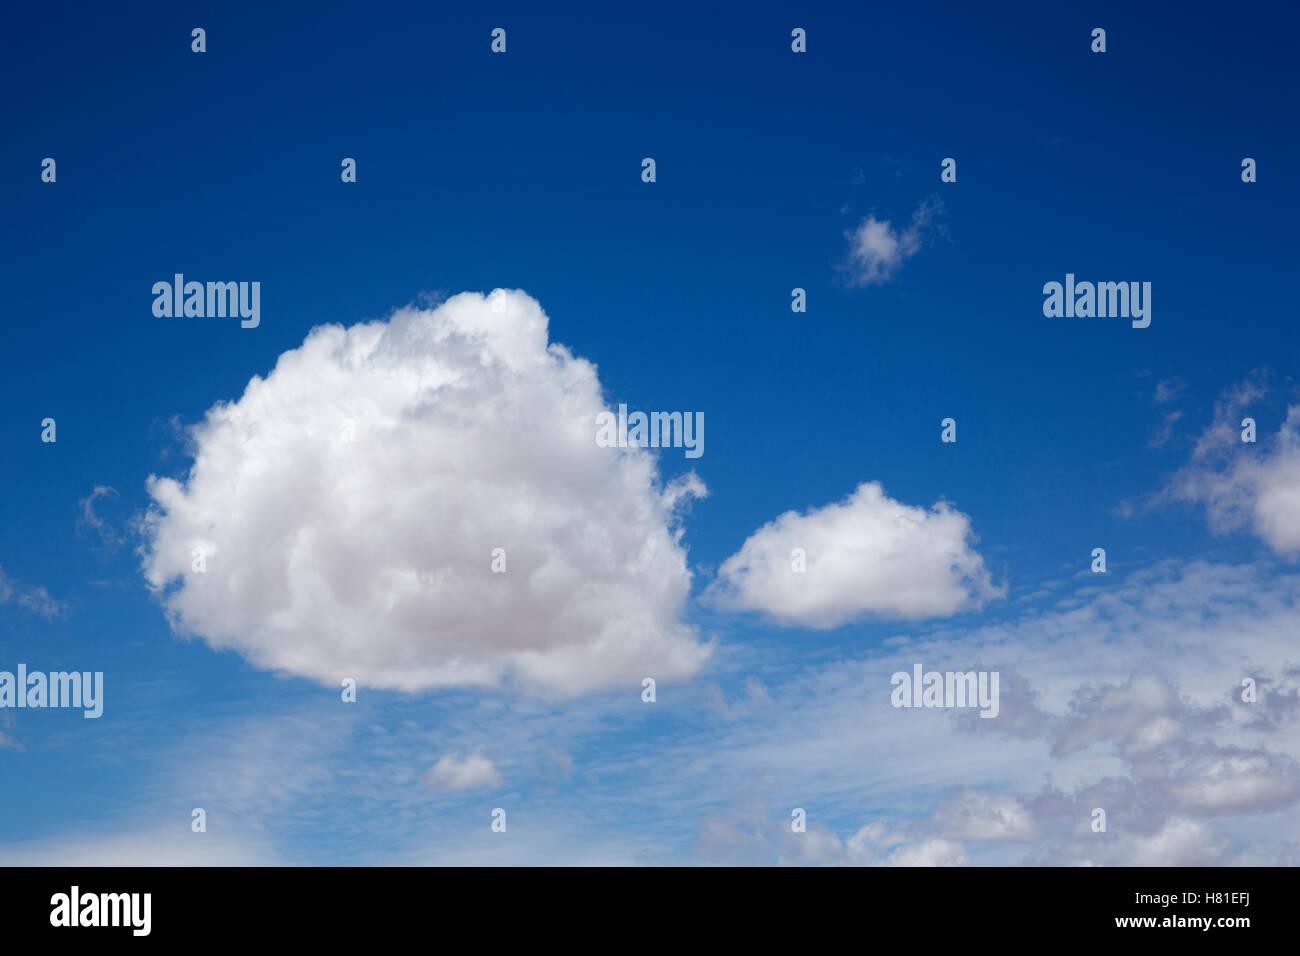 cumulus clouds against a blue sky - Stock Image